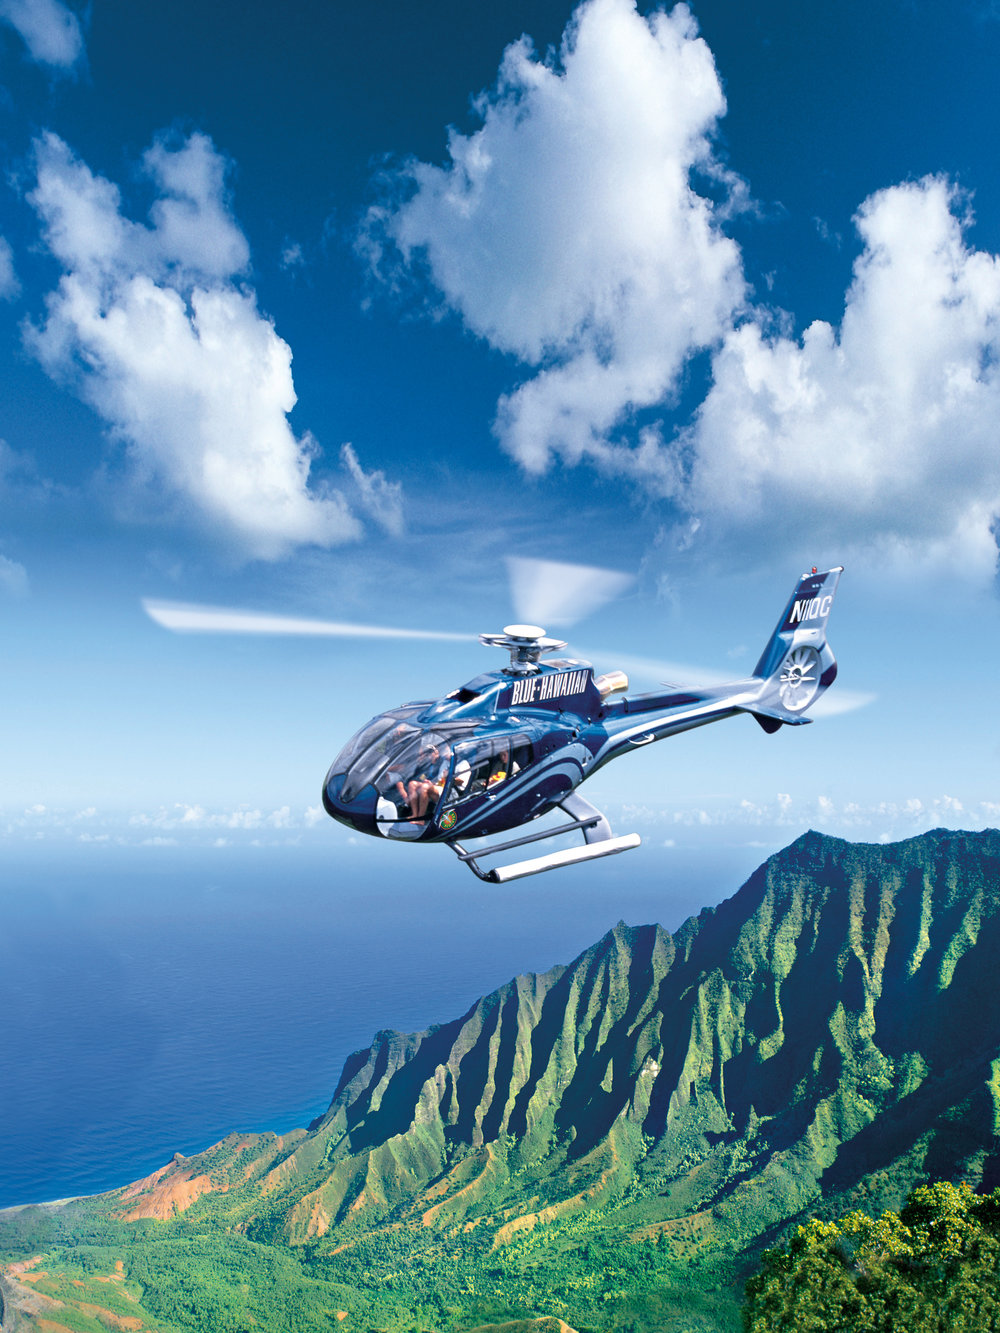 Kauai-Kalalau-Helicopter.jpg